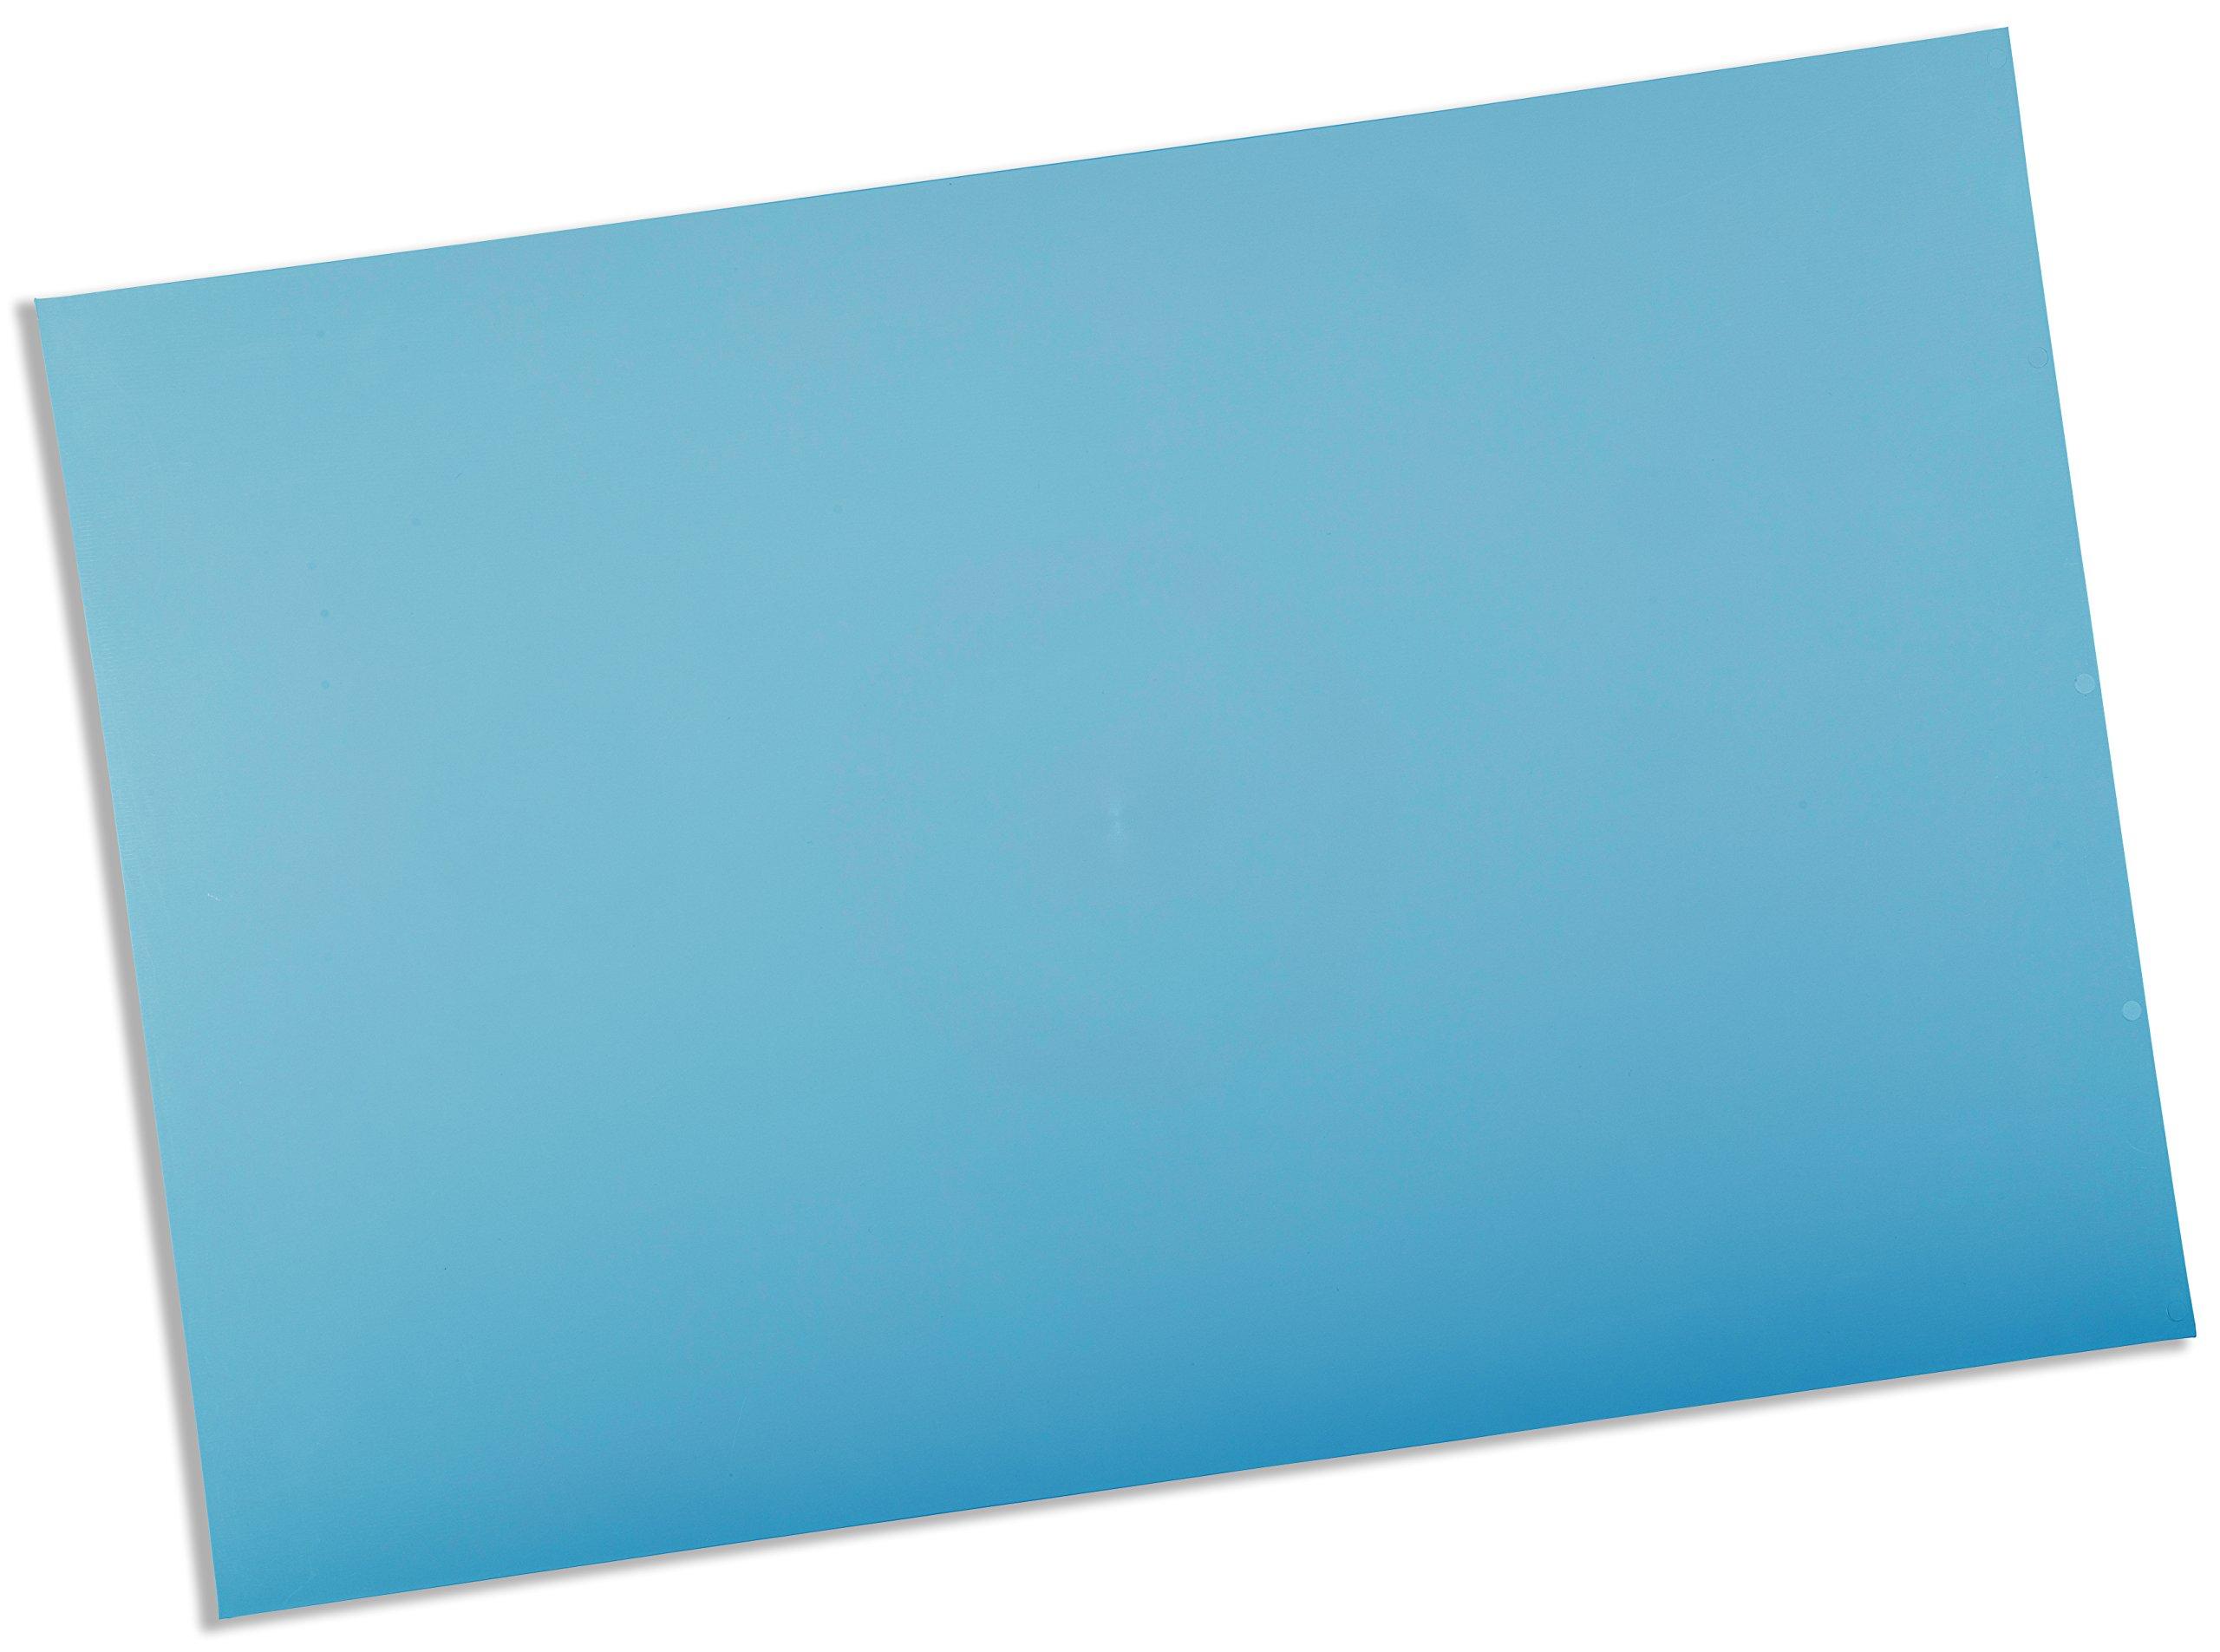 Rolyan Splinting Material Sheet, Ezeform, Blue, 1/8'' x 24'' x 36'', Solid, Single Sheet